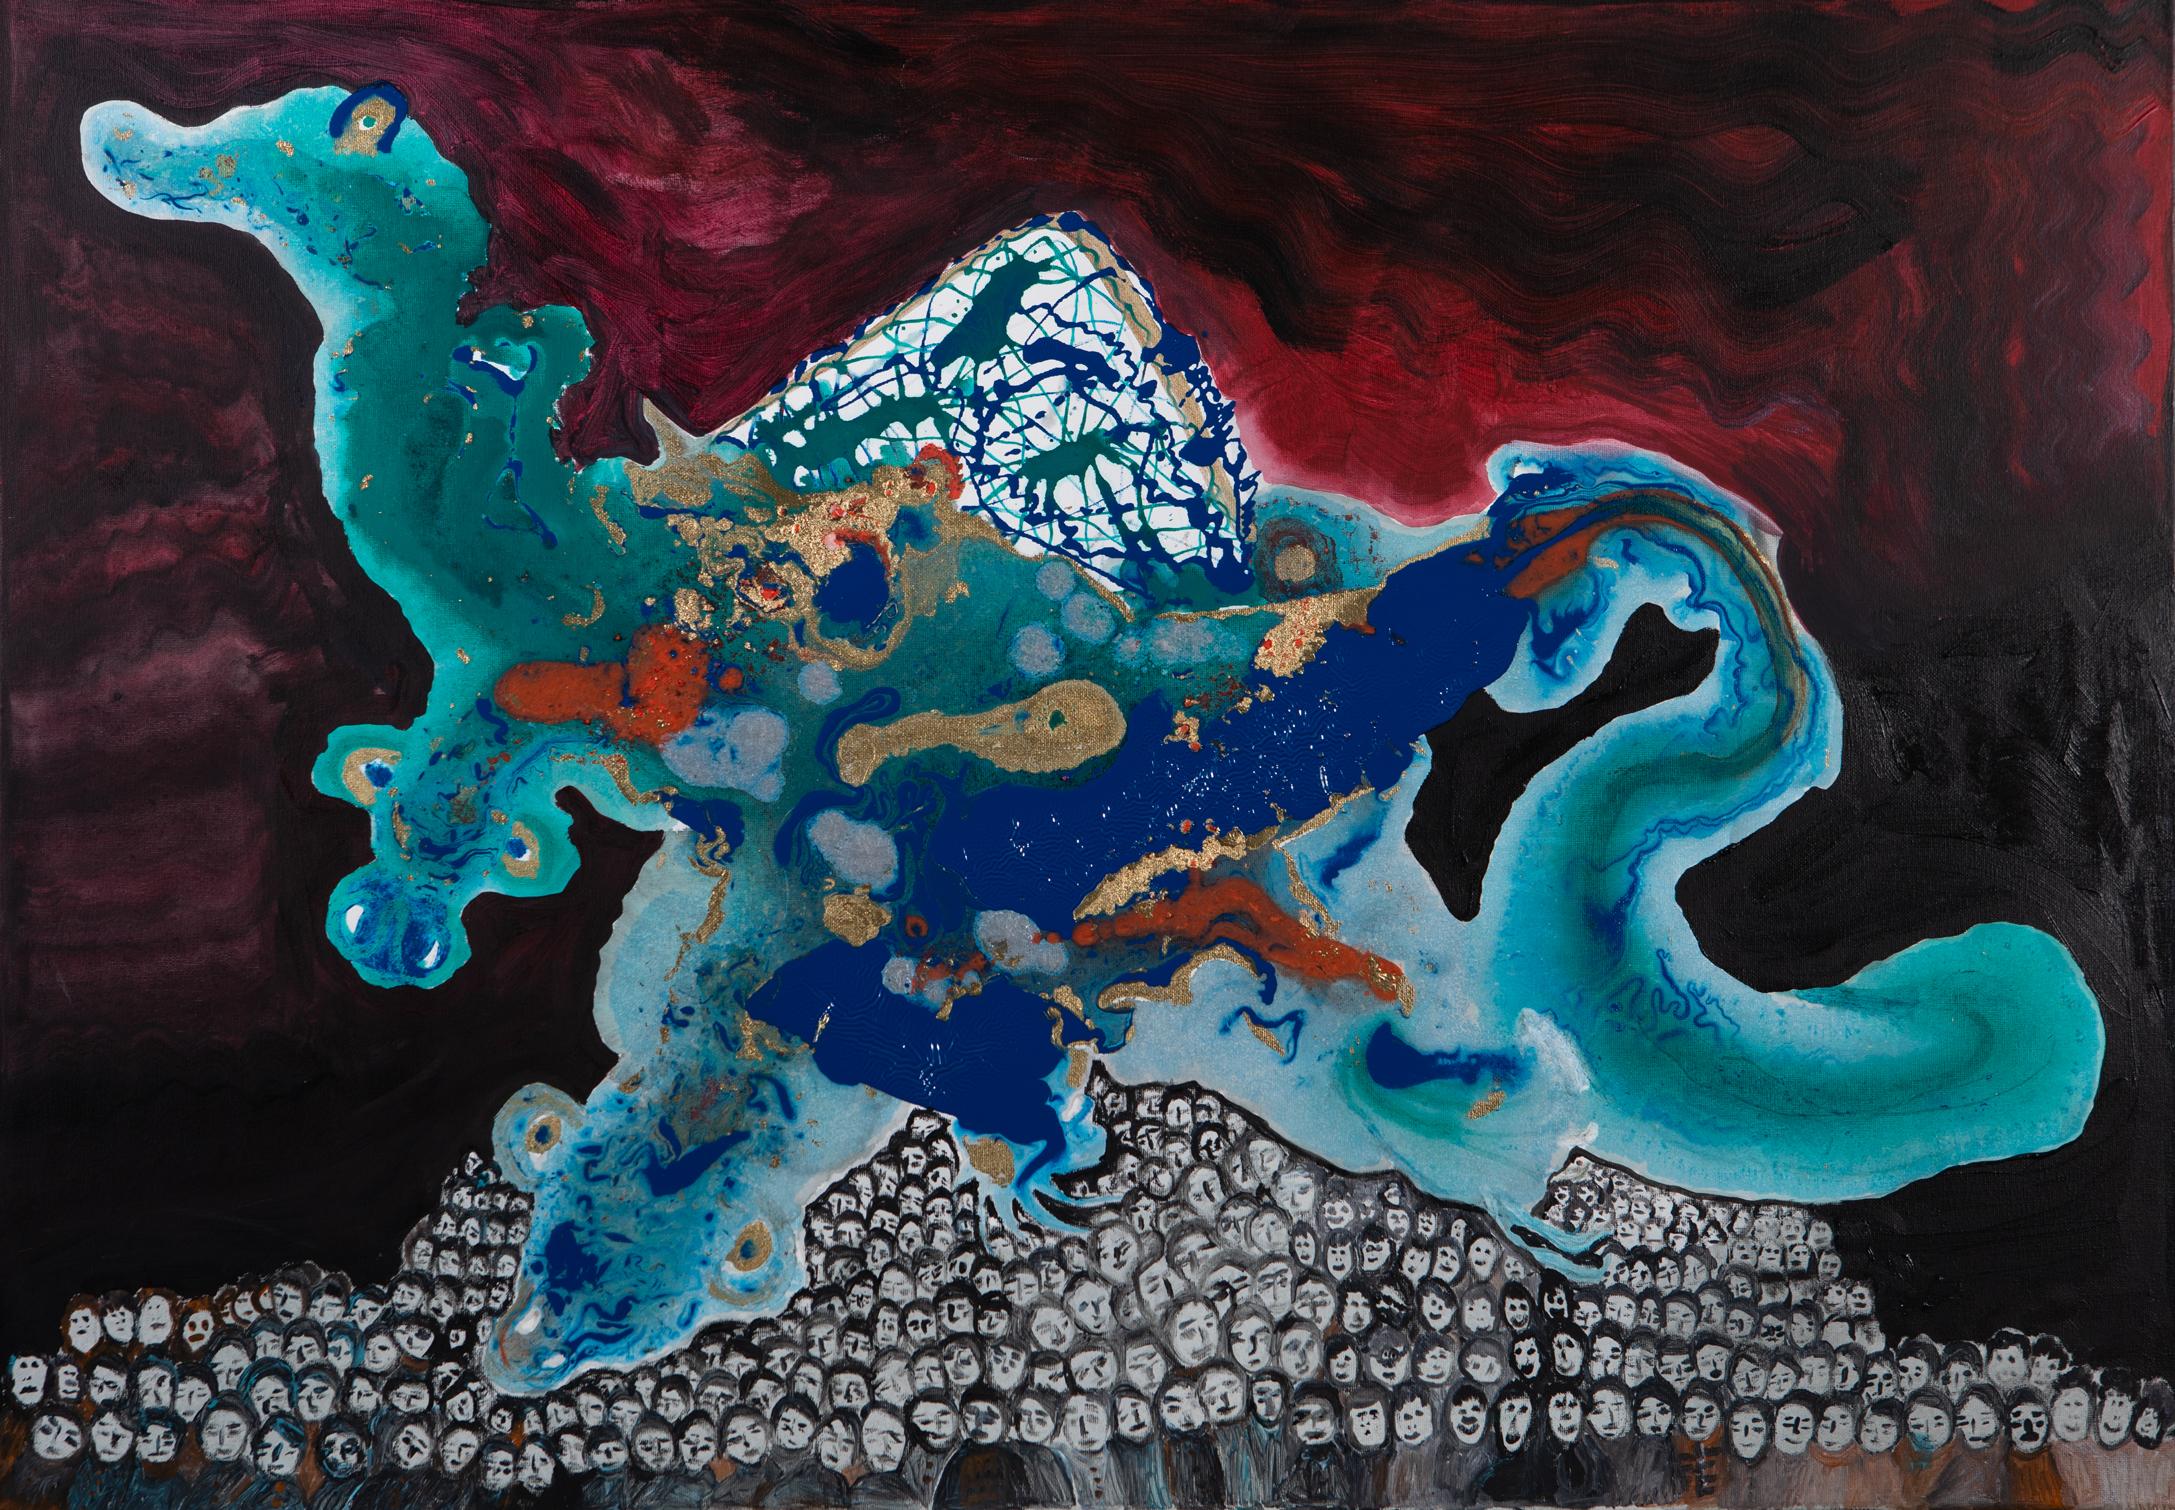 Dreiköpfiger Drache - 2016Acryl auf Leinwand70 x 100 cm